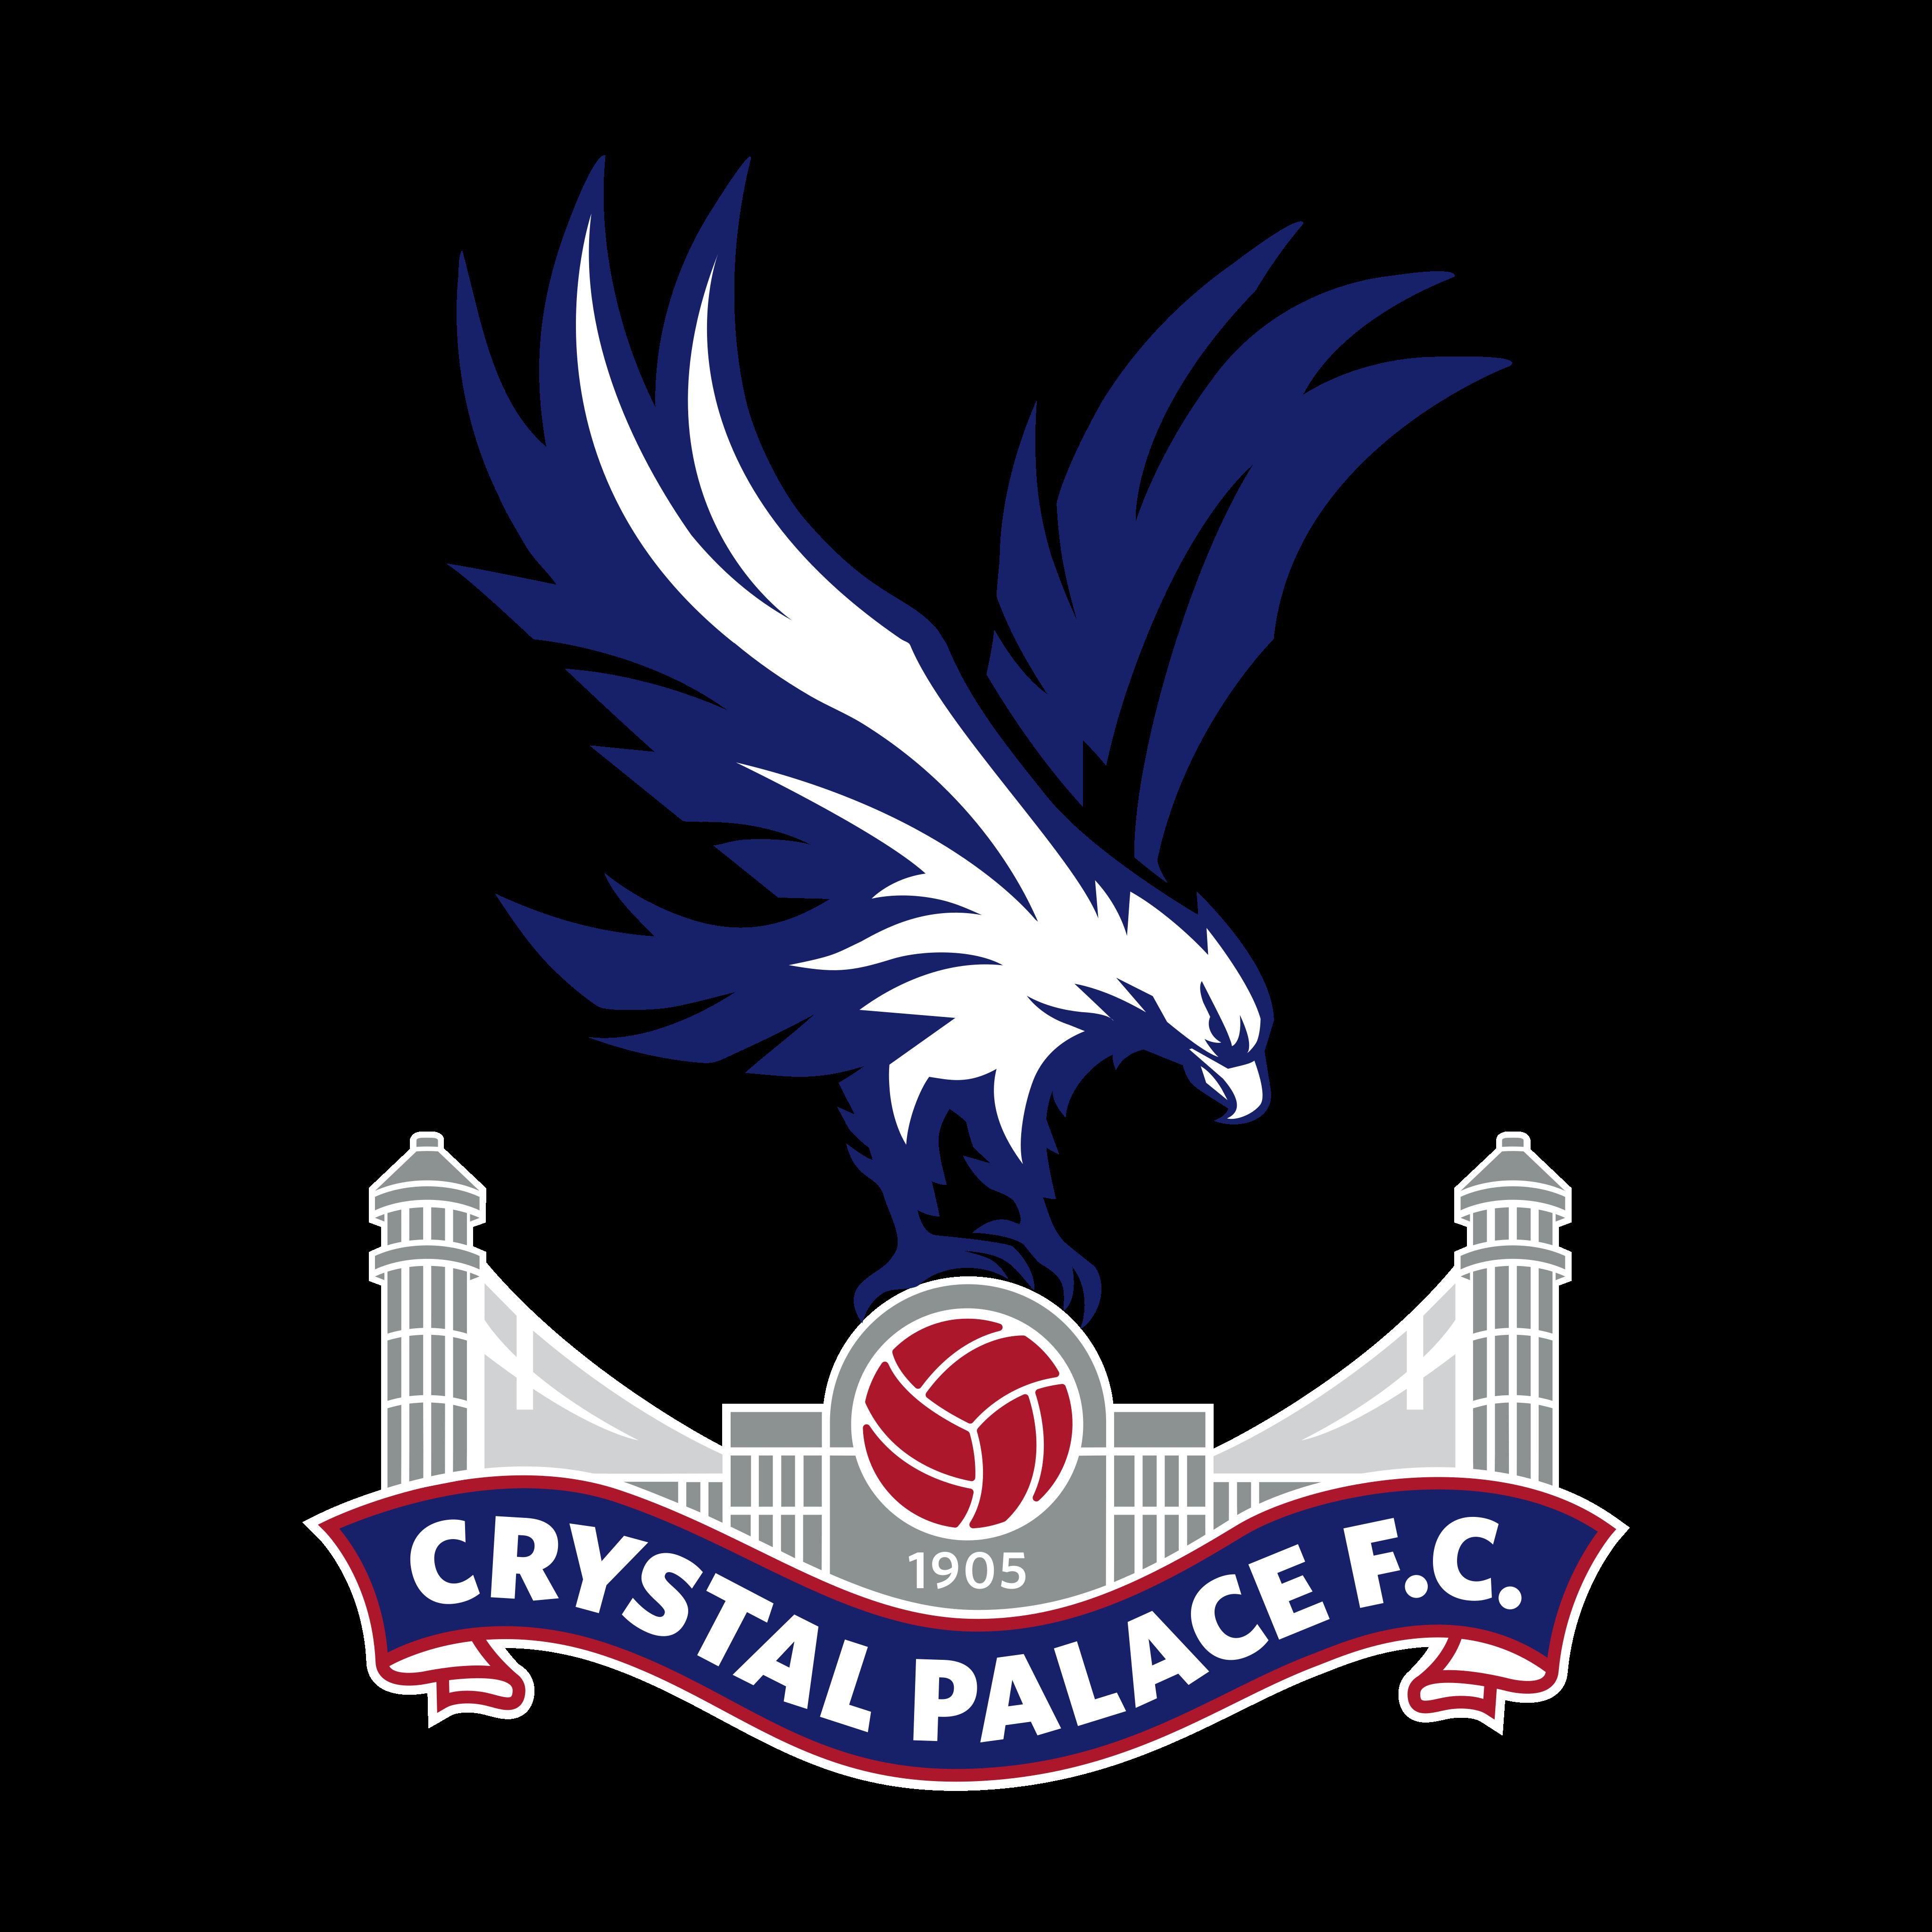 crystal palace logo.